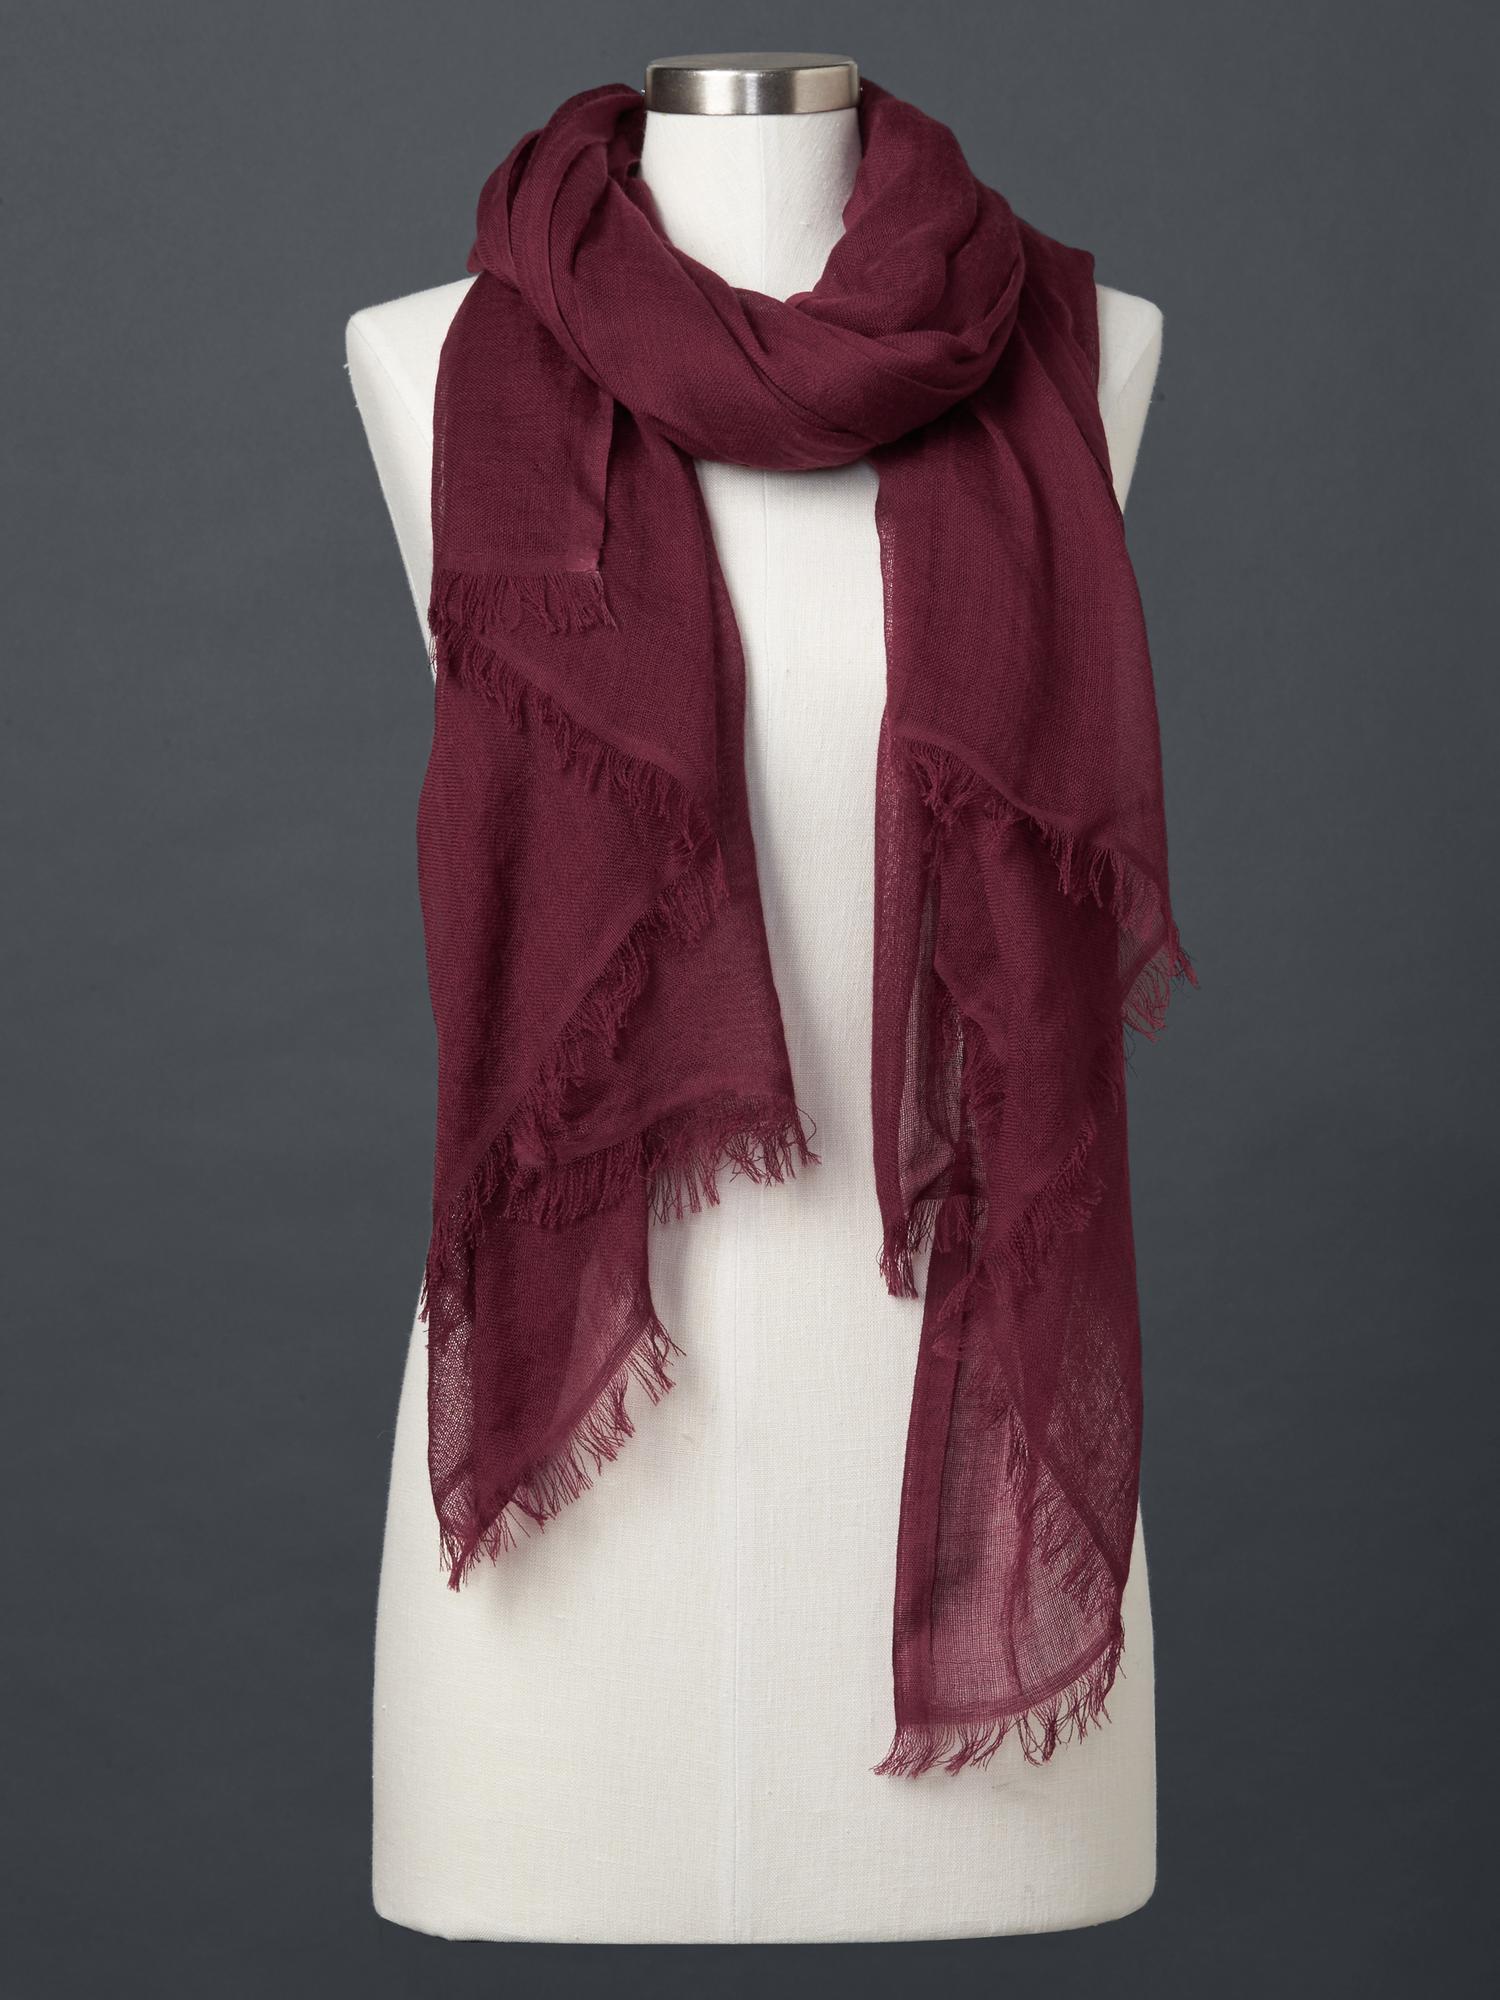 gap wool solid scarf in purple burgundy lyst